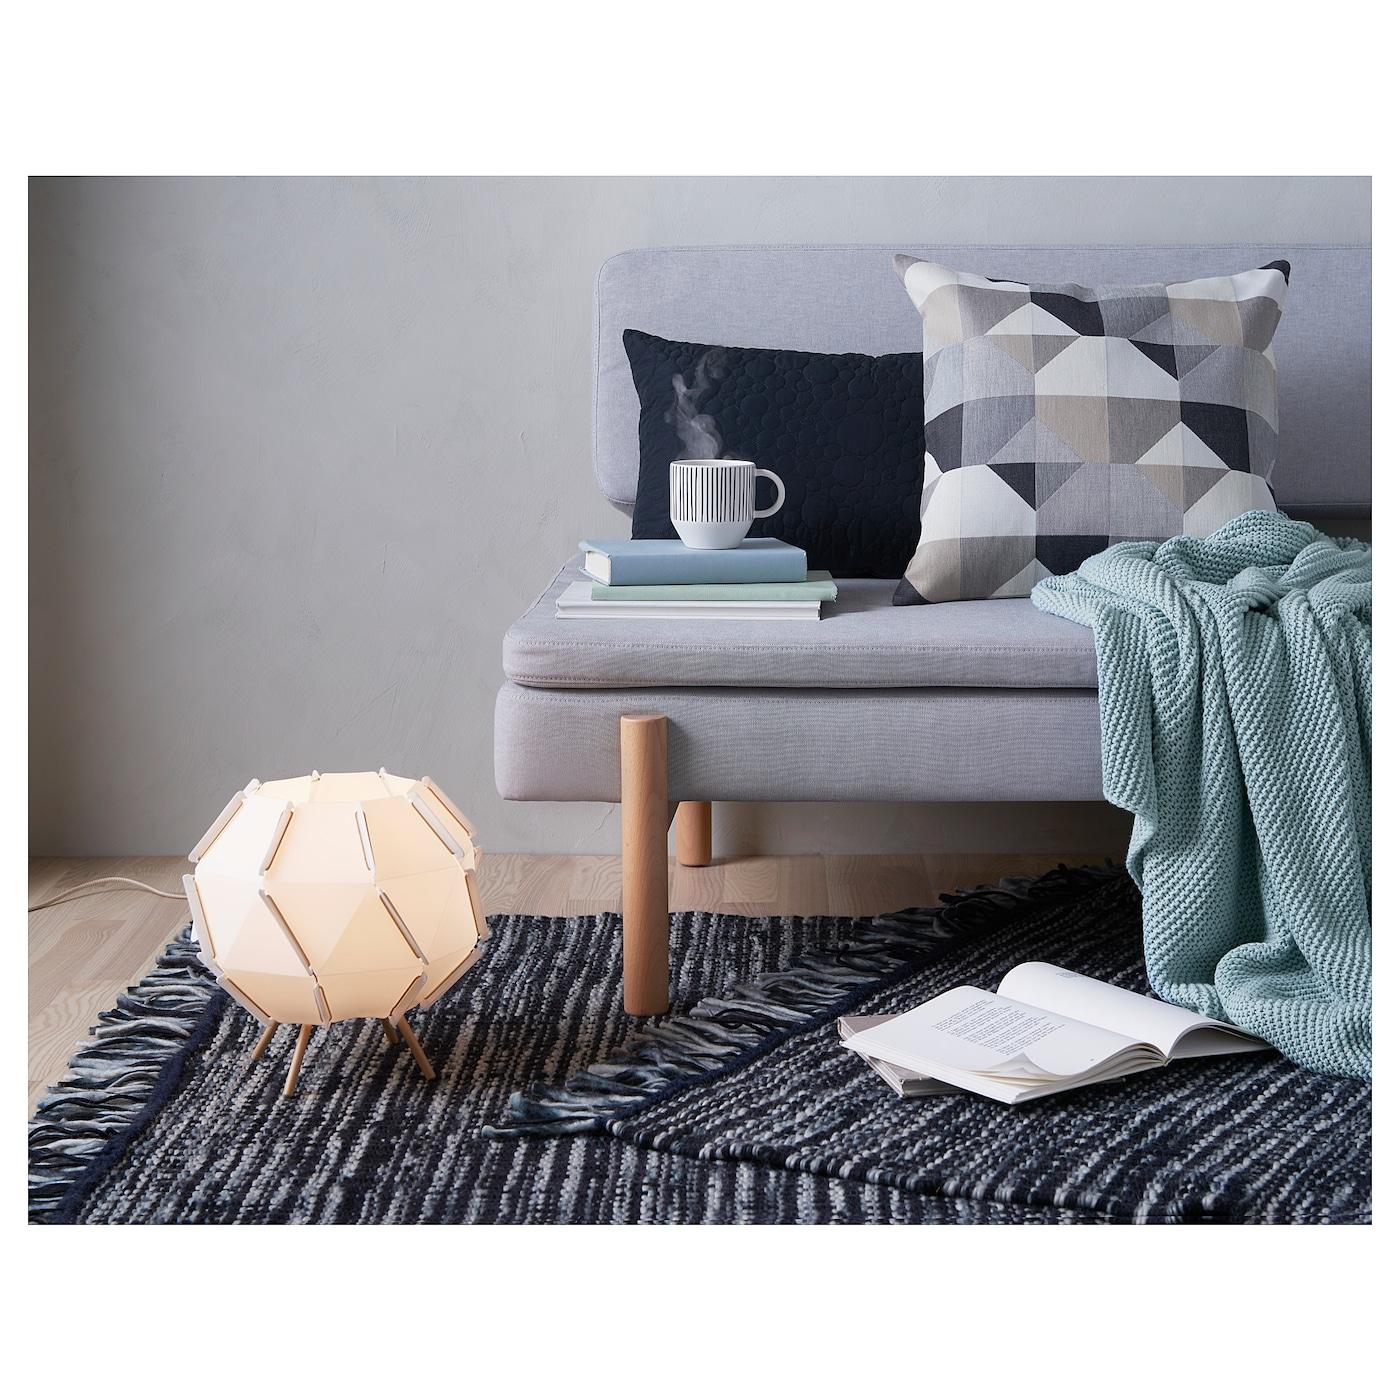 svarth housse de coussin beige 50x50 cm ikea. Black Bedroom Furniture Sets. Home Design Ideas